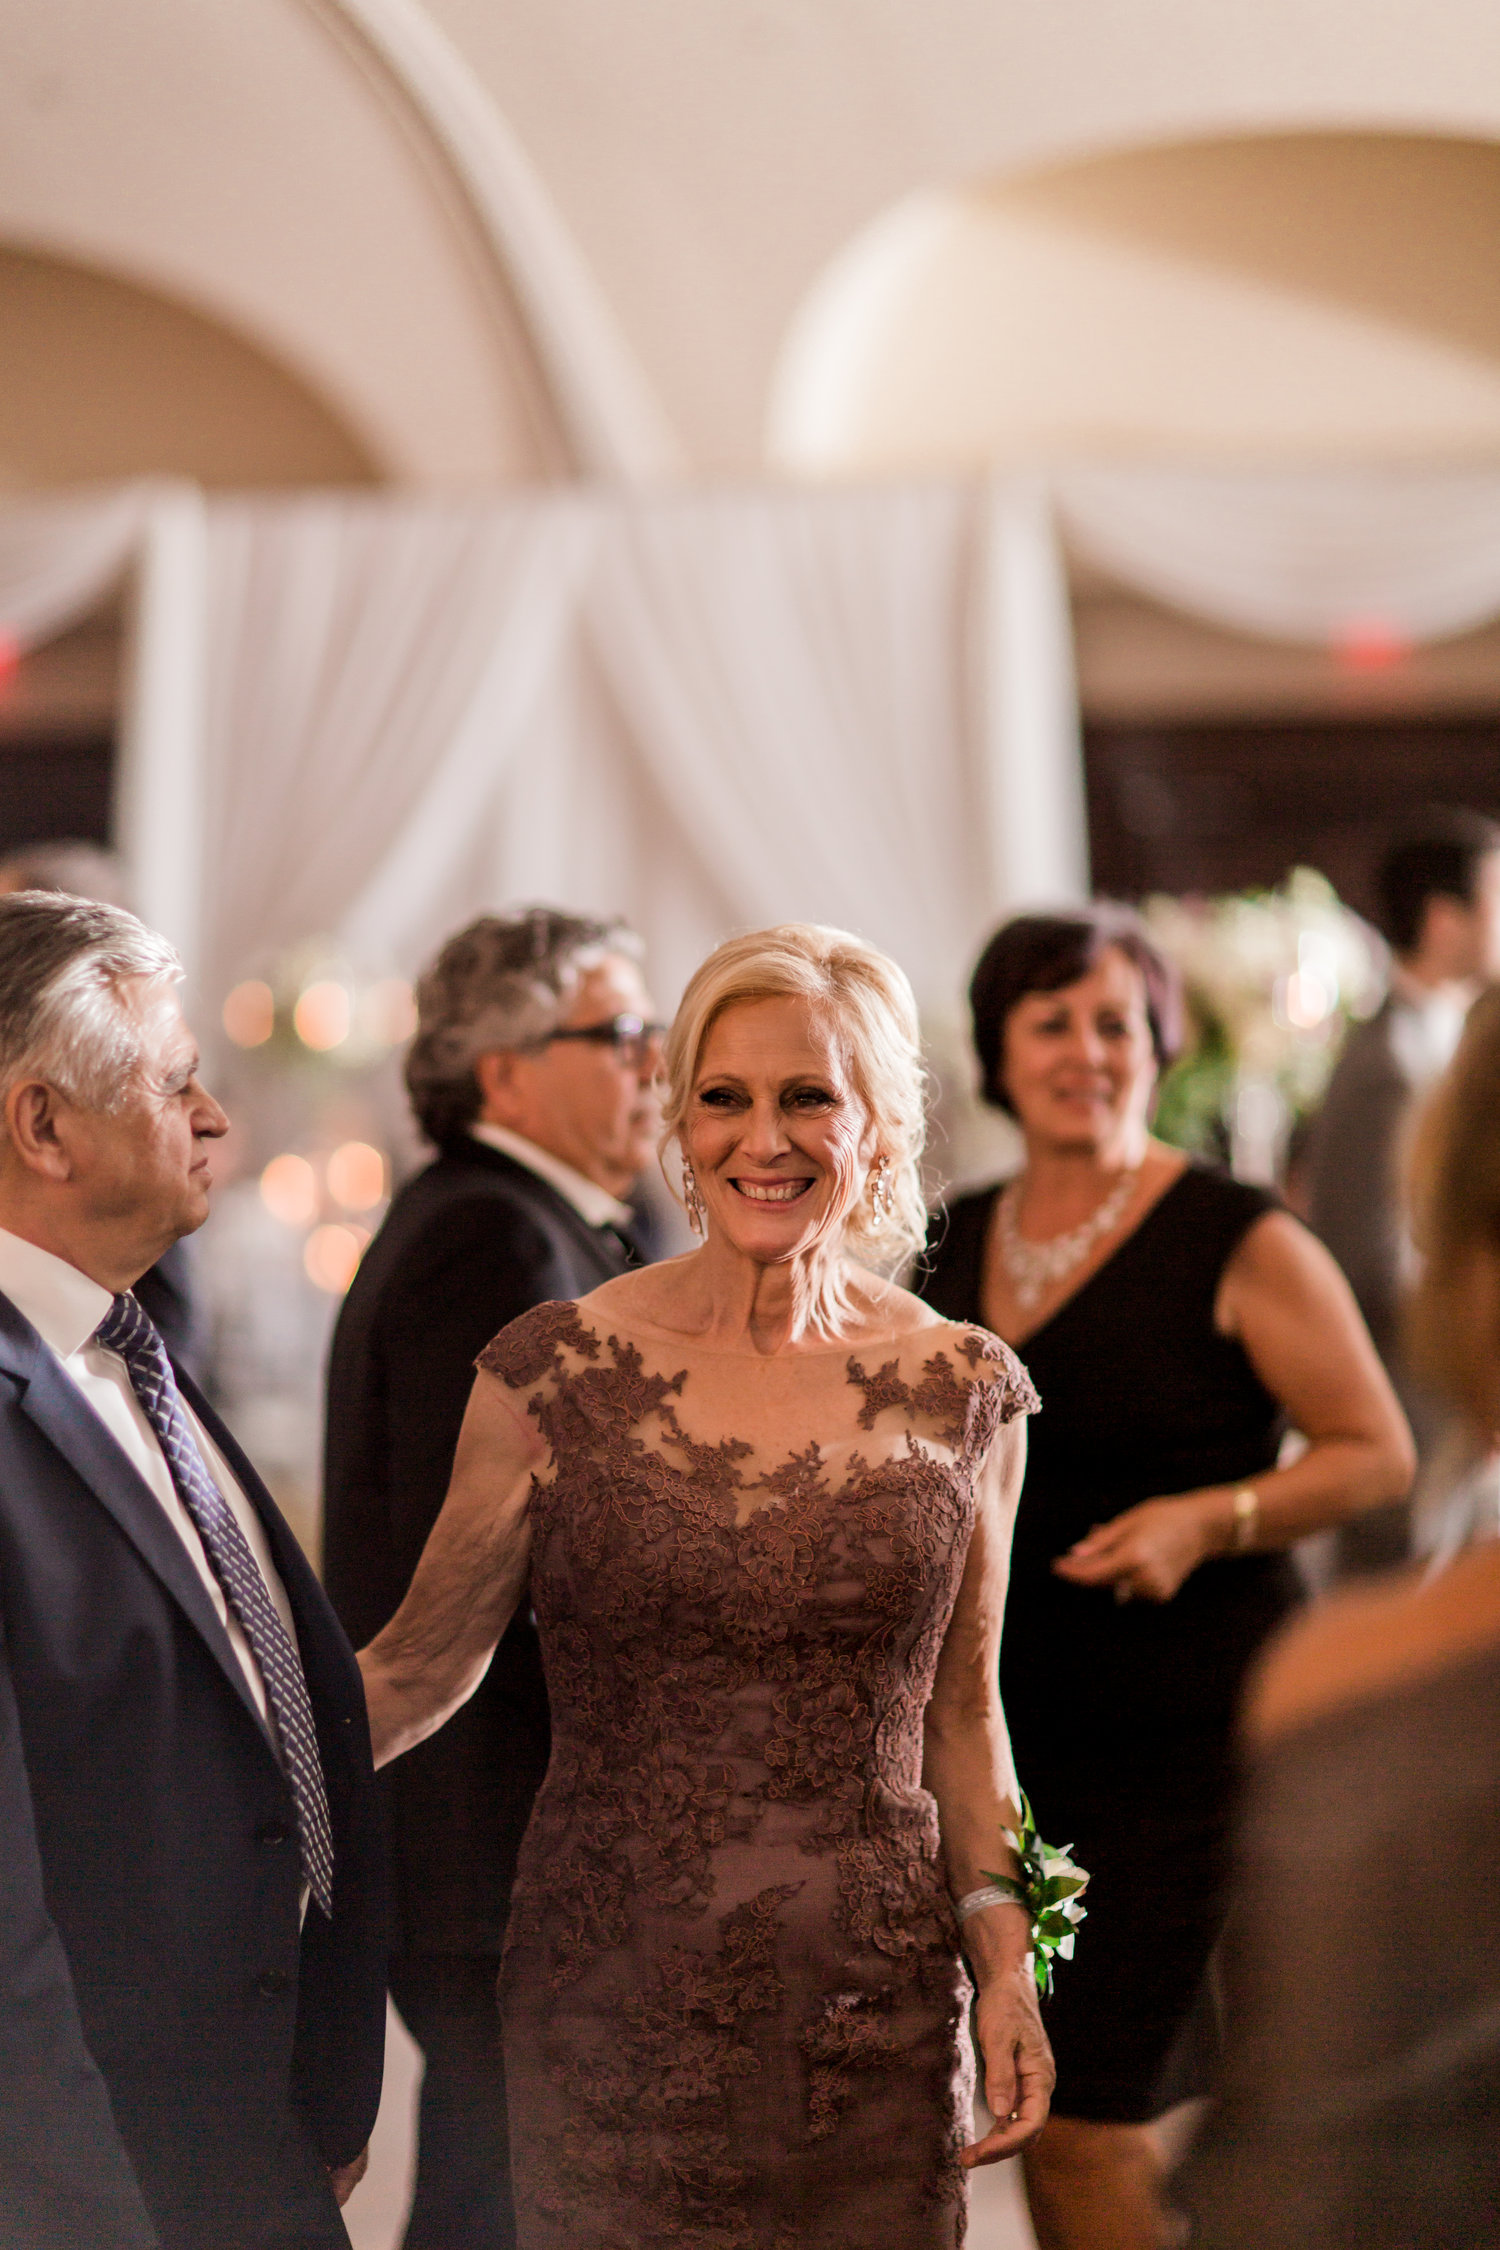 Danielle-Giroux-Amir-Golbazi-Toronto-Wedding-Photographer-Bellvue-Manor_DeLuca_2-762.jpg